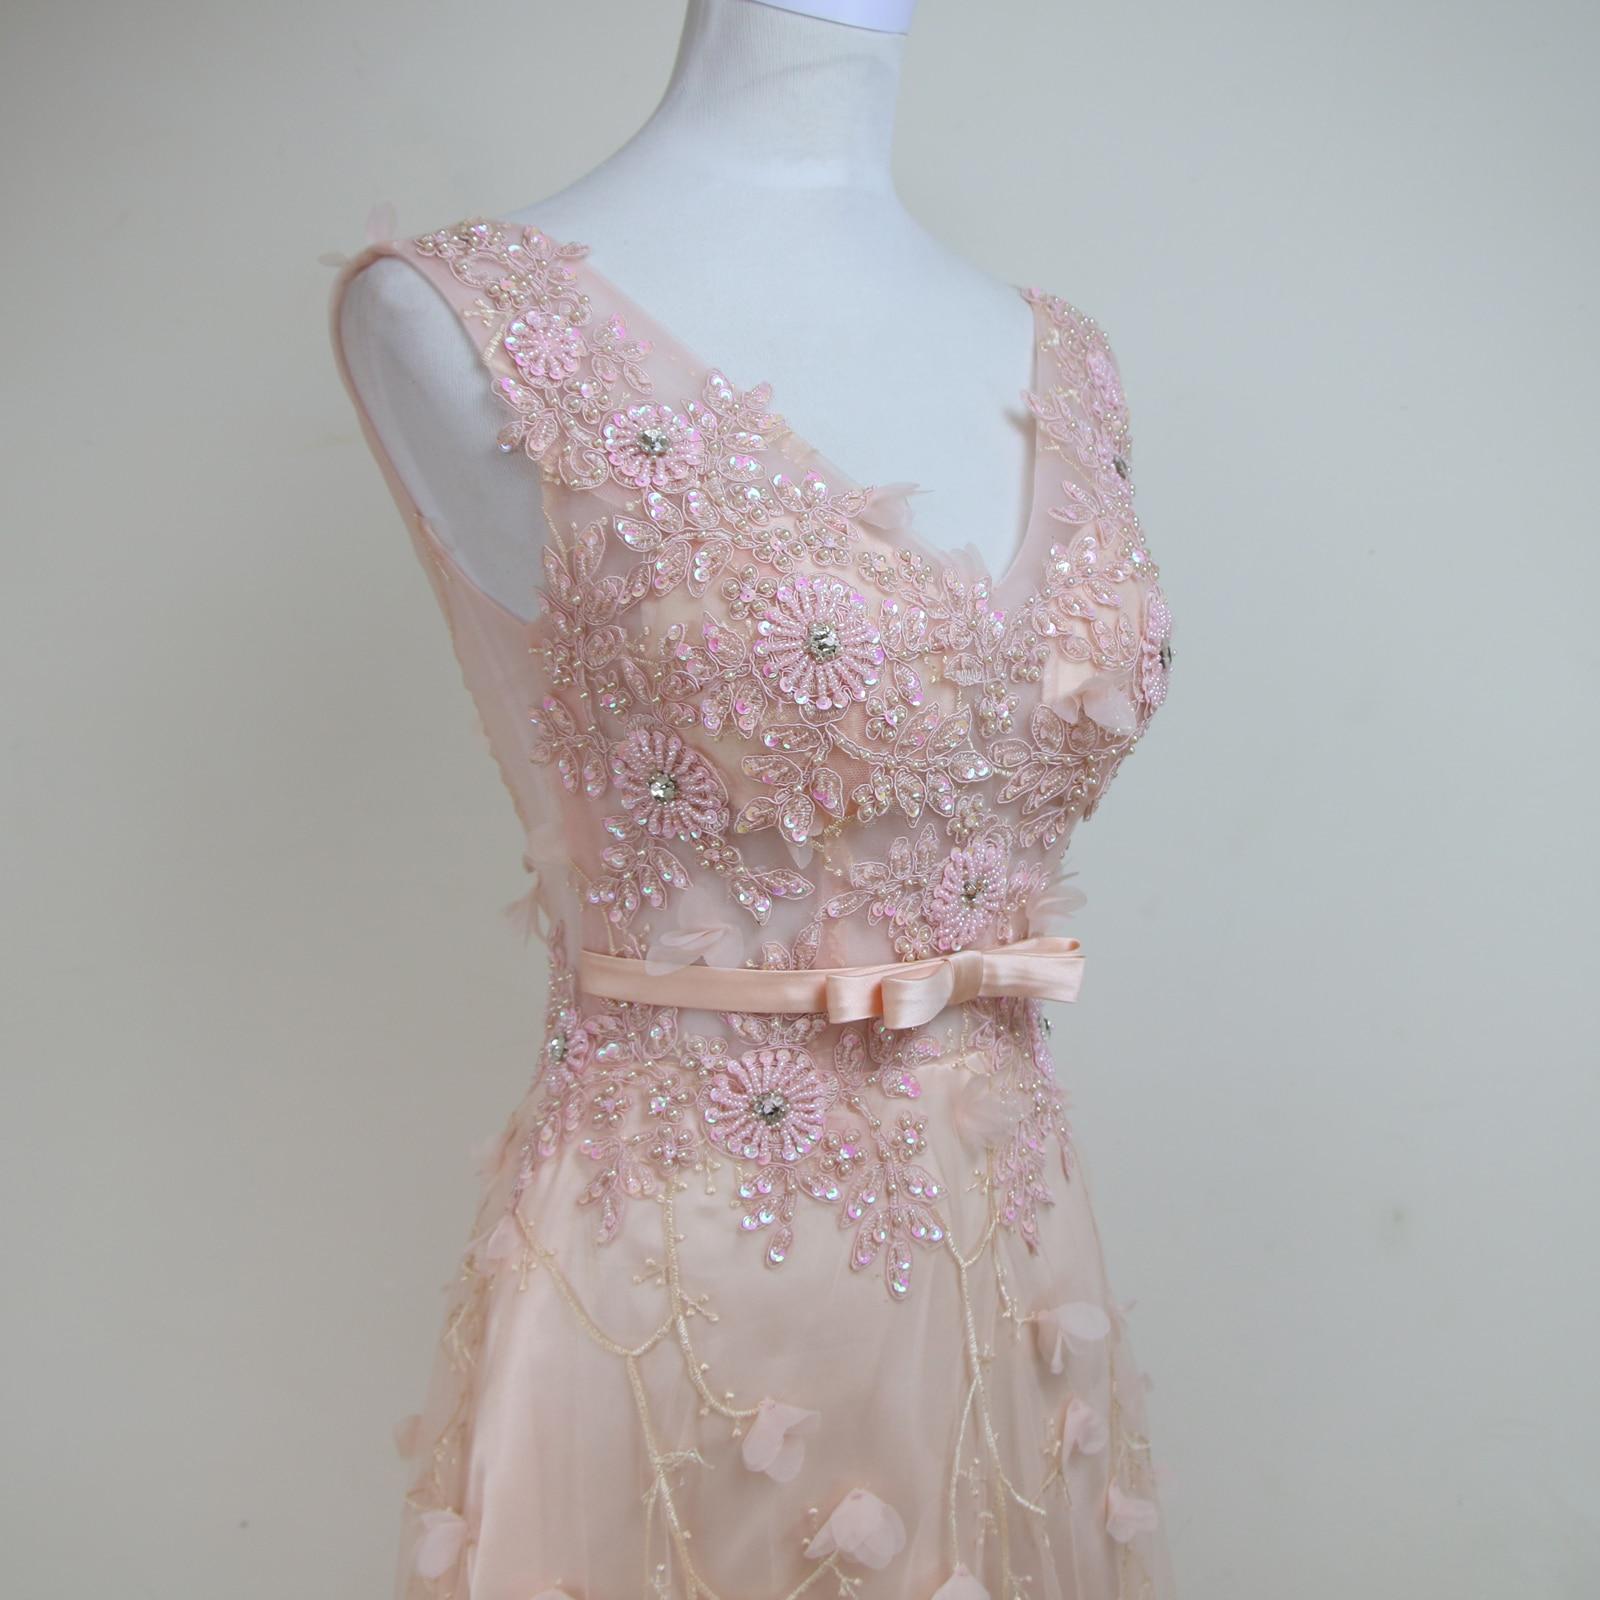 Rosa Abendkleid Perlen Strass Abend kleid kleid Rotes Formales